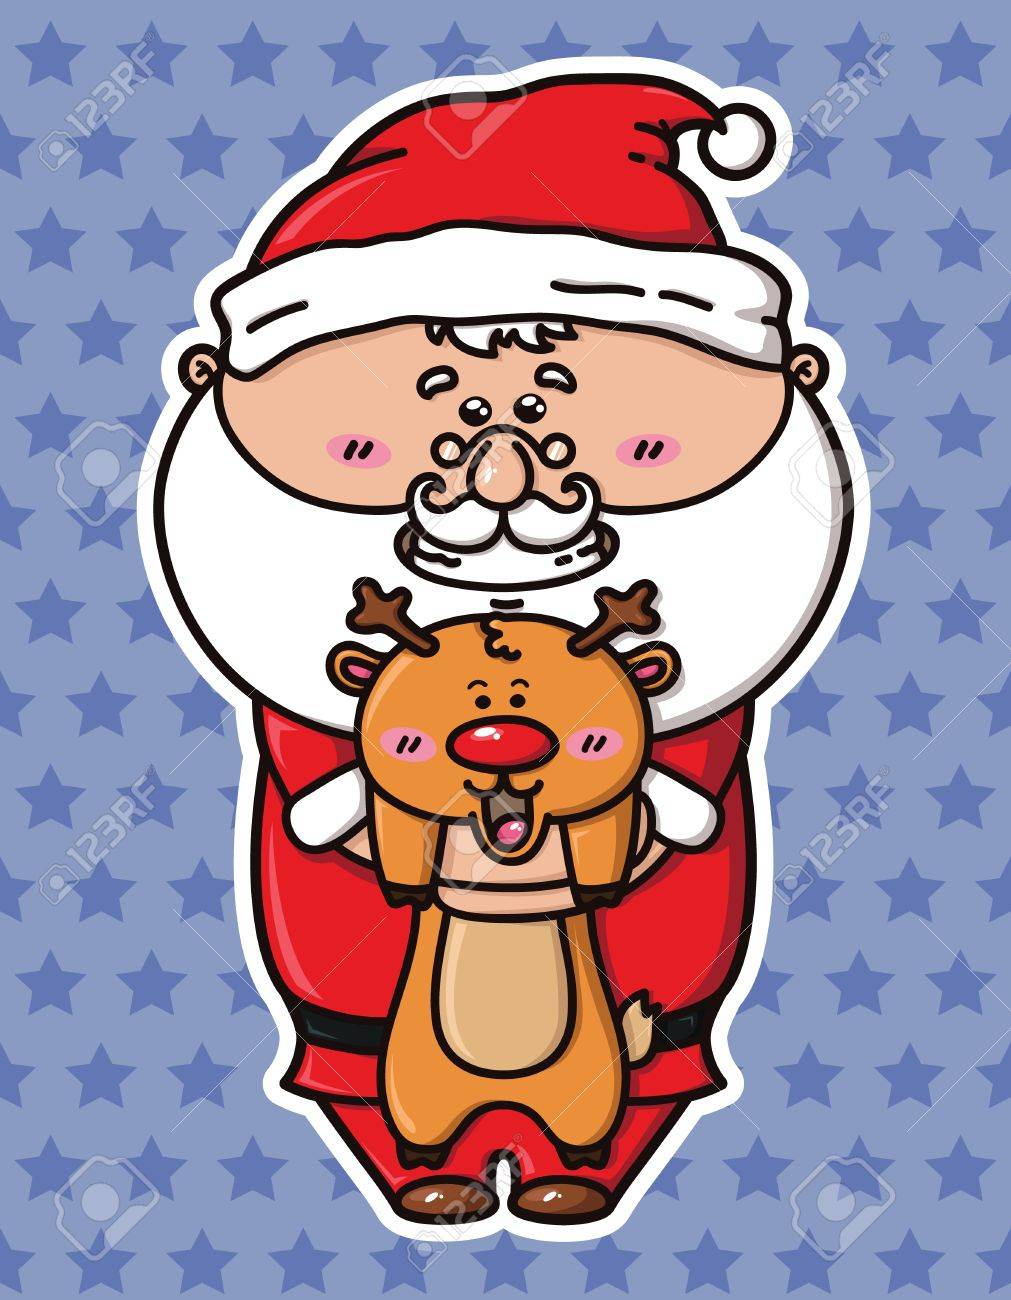 Kawaii Père Noël Qui Tient Le Cerf Clip Art Libres De Droits